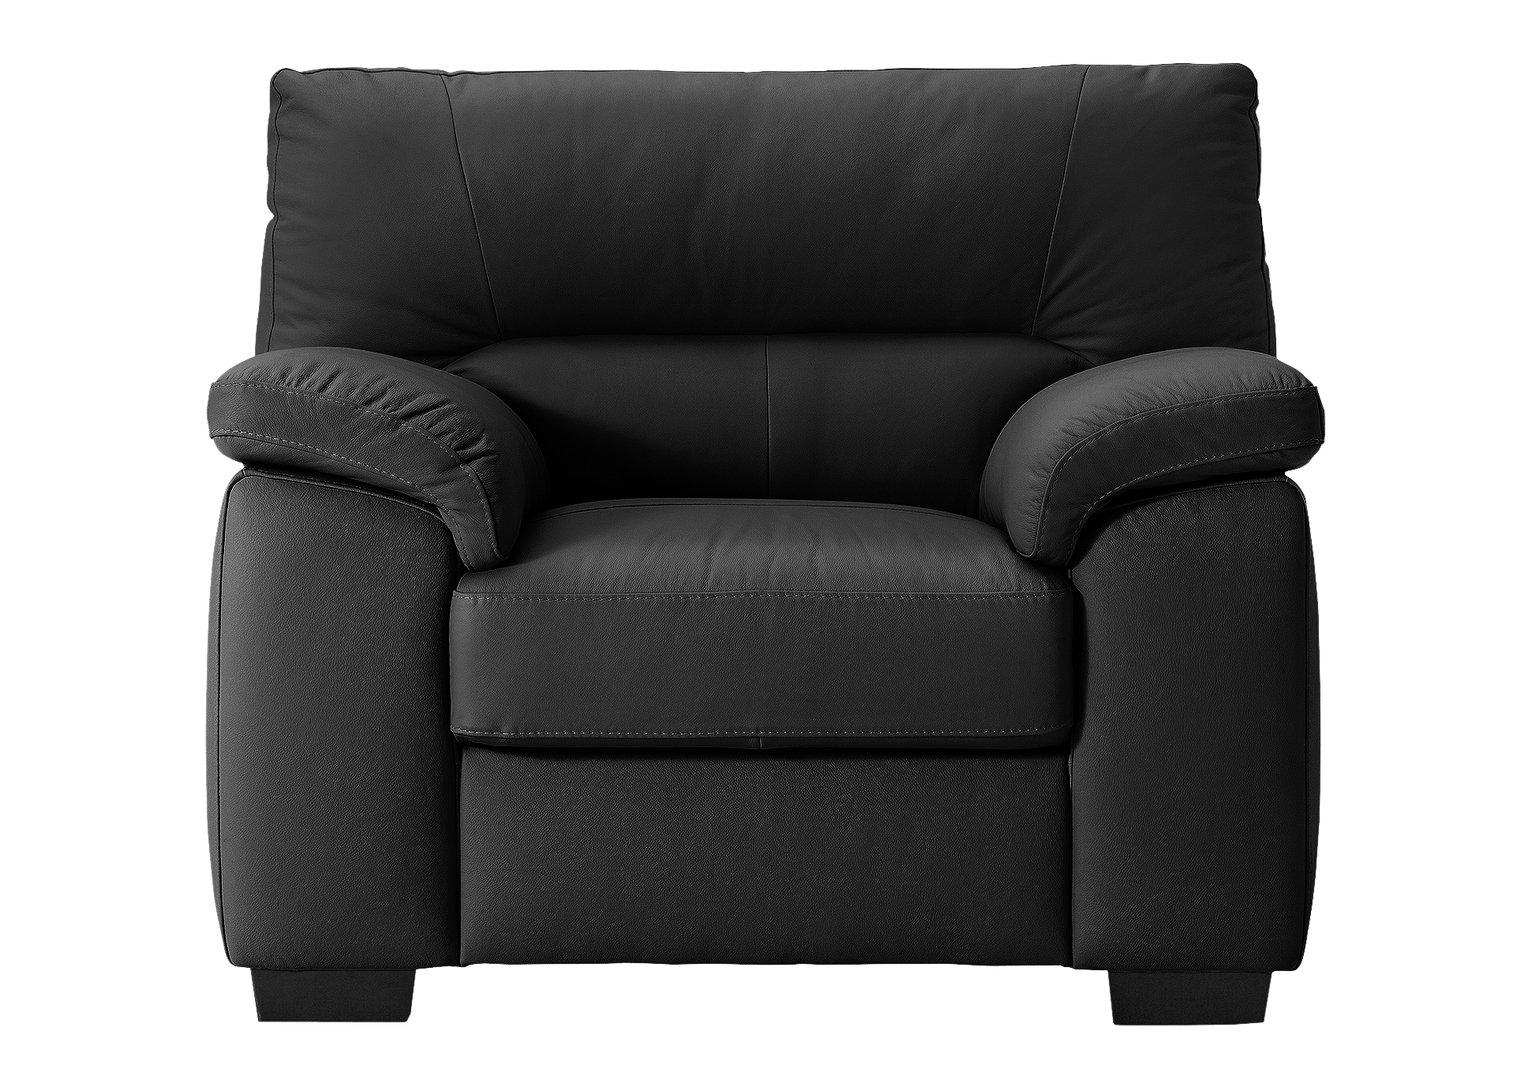 Argos Home Piacenza Leather Armchair - Black